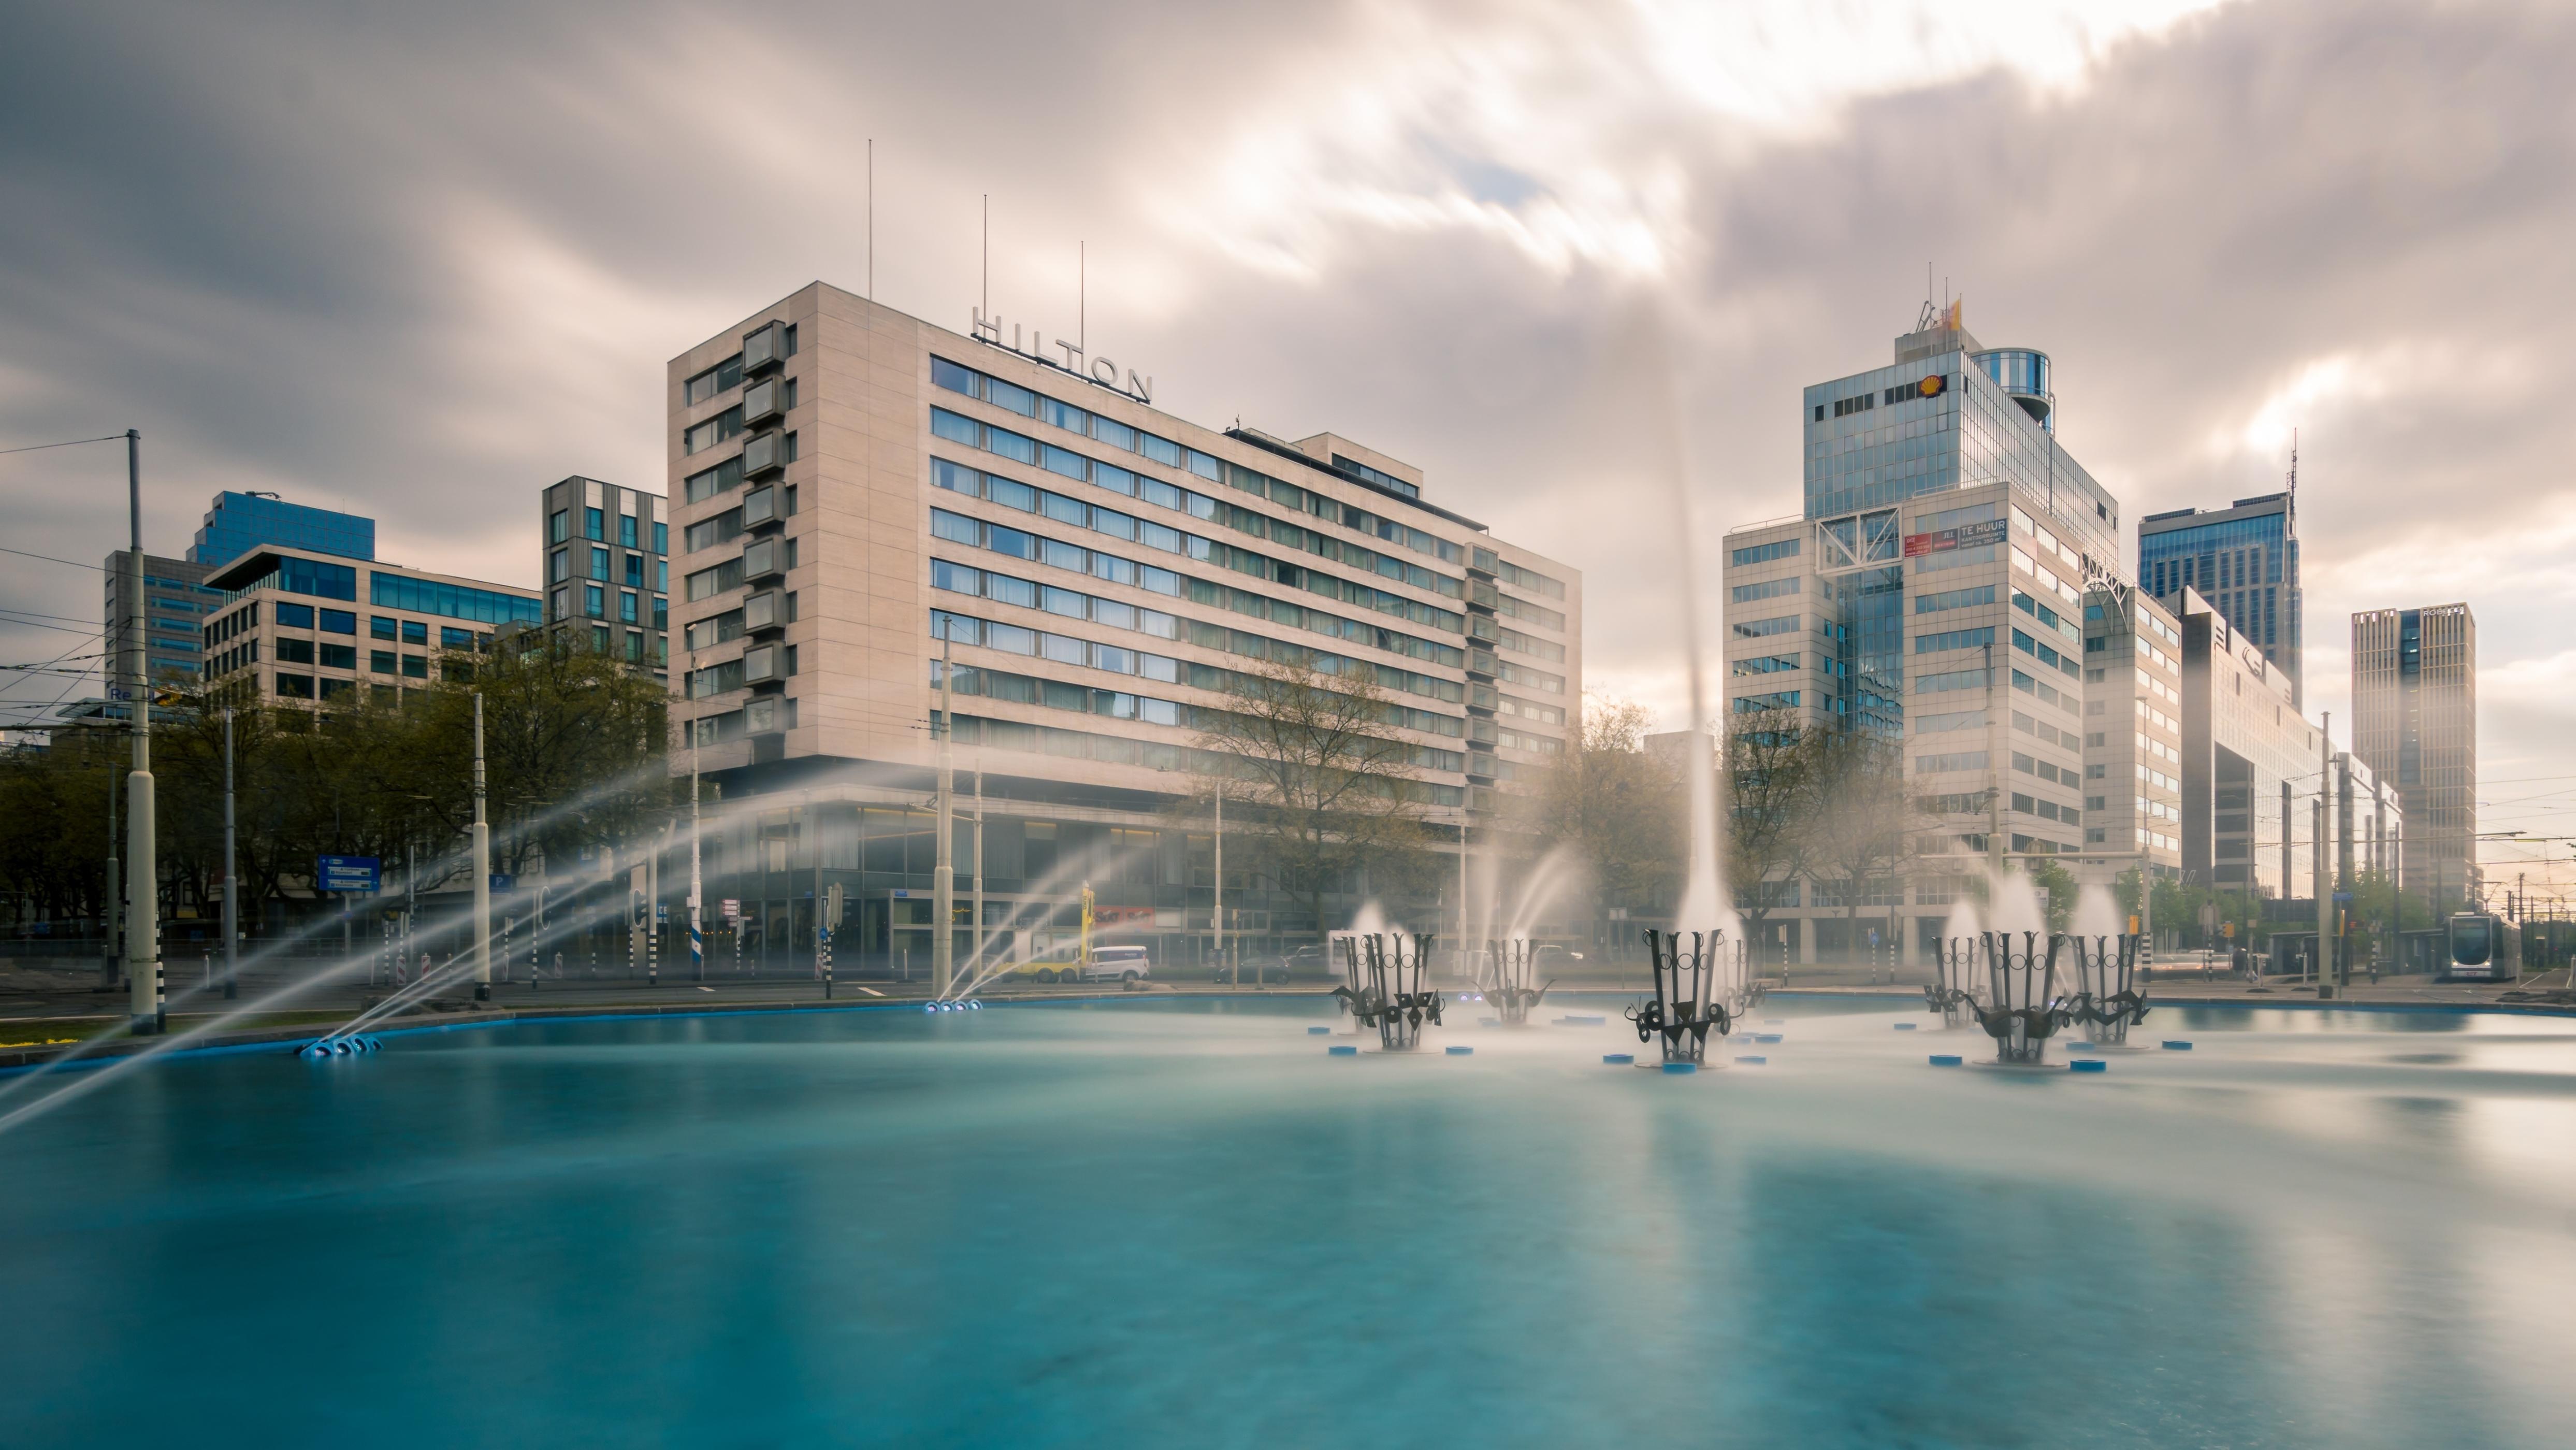 hilton 50 jaar Hilton Rotterdam viert 55 jarig bestaan met ludieke actie hilton 50 jaar